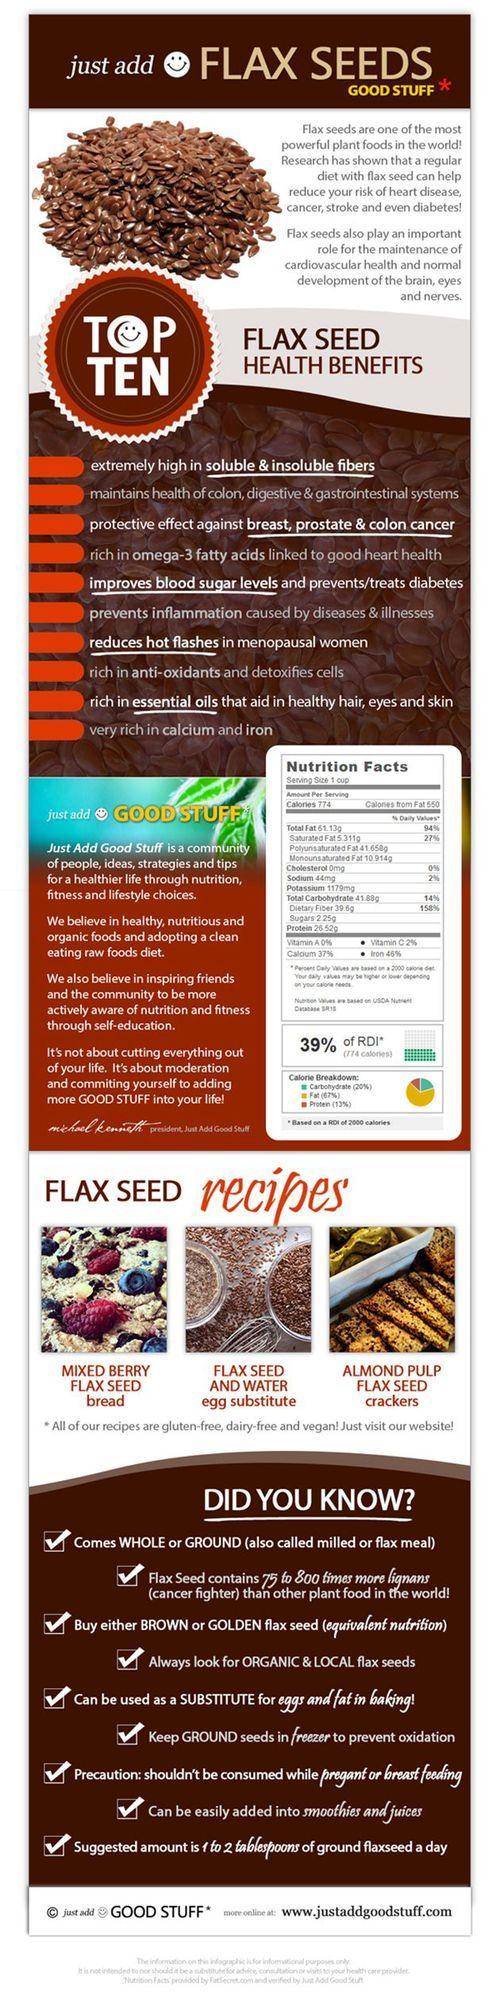 Health Benefit of Flax Seeds | Healthy Food, Healthy...